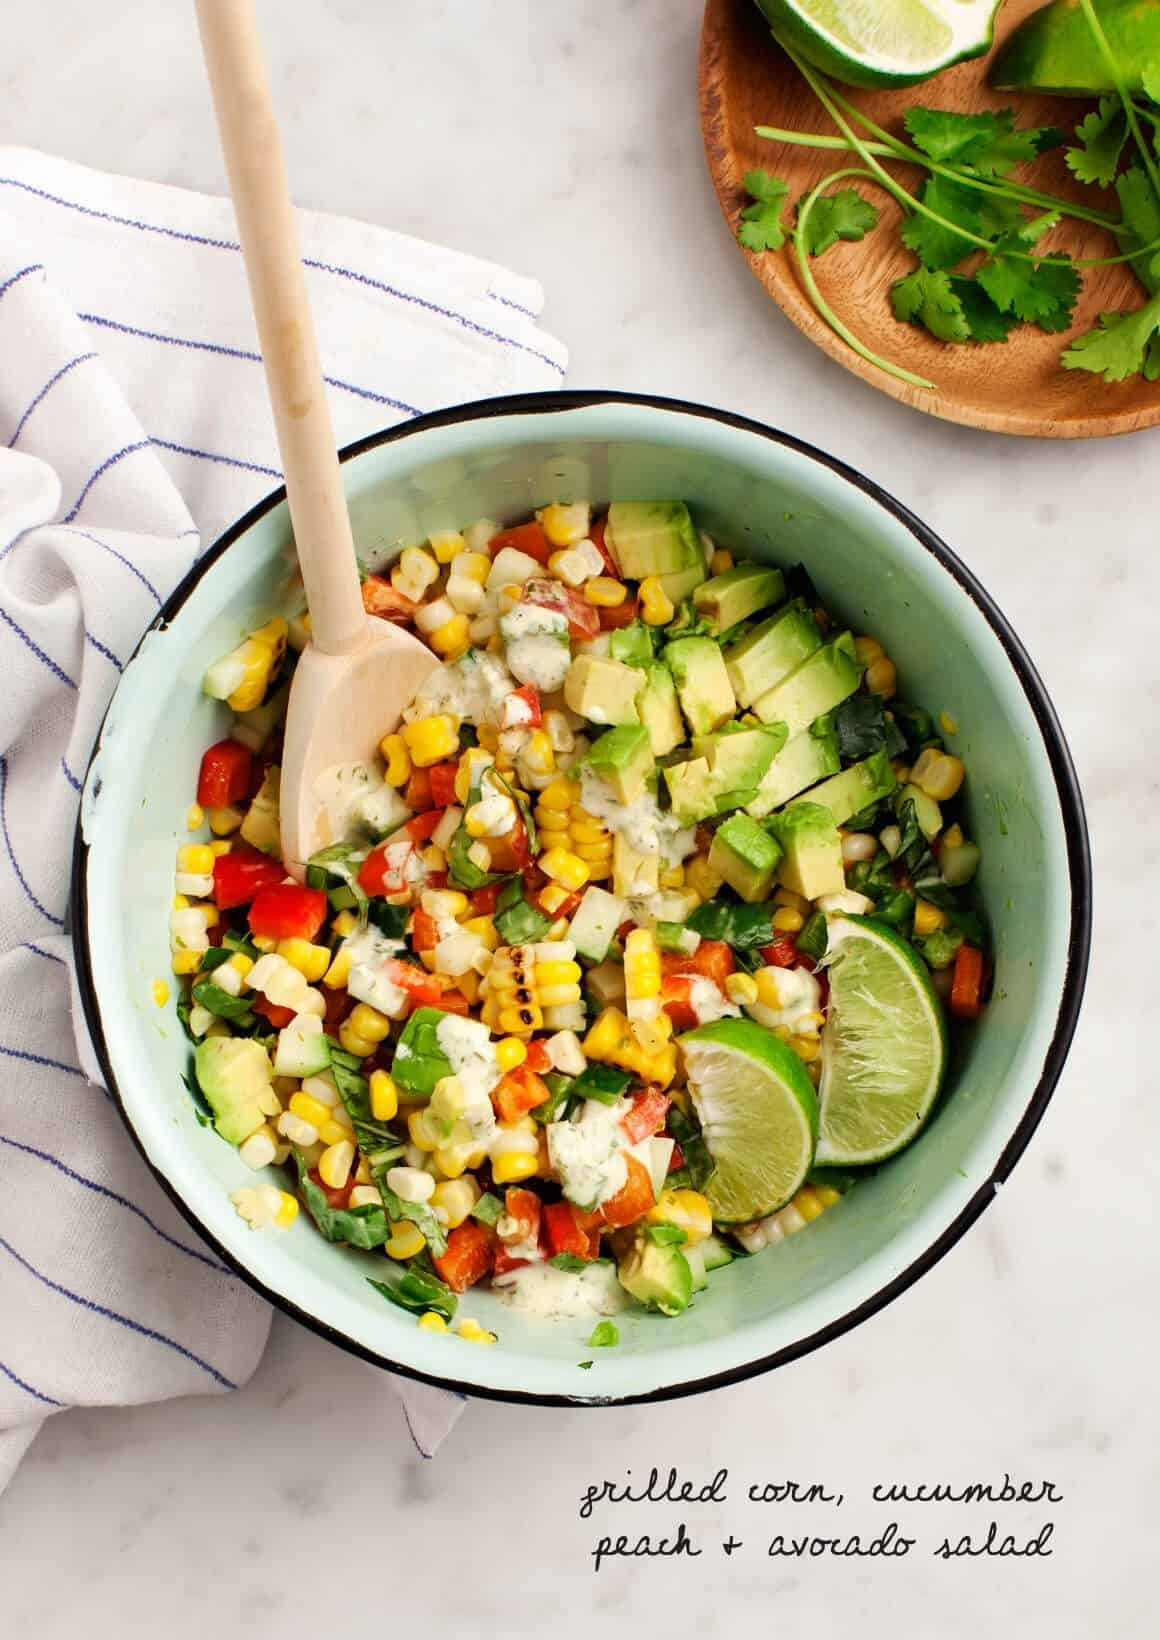 Grilled Corn, Cucumber, Peach & Avocado Salad